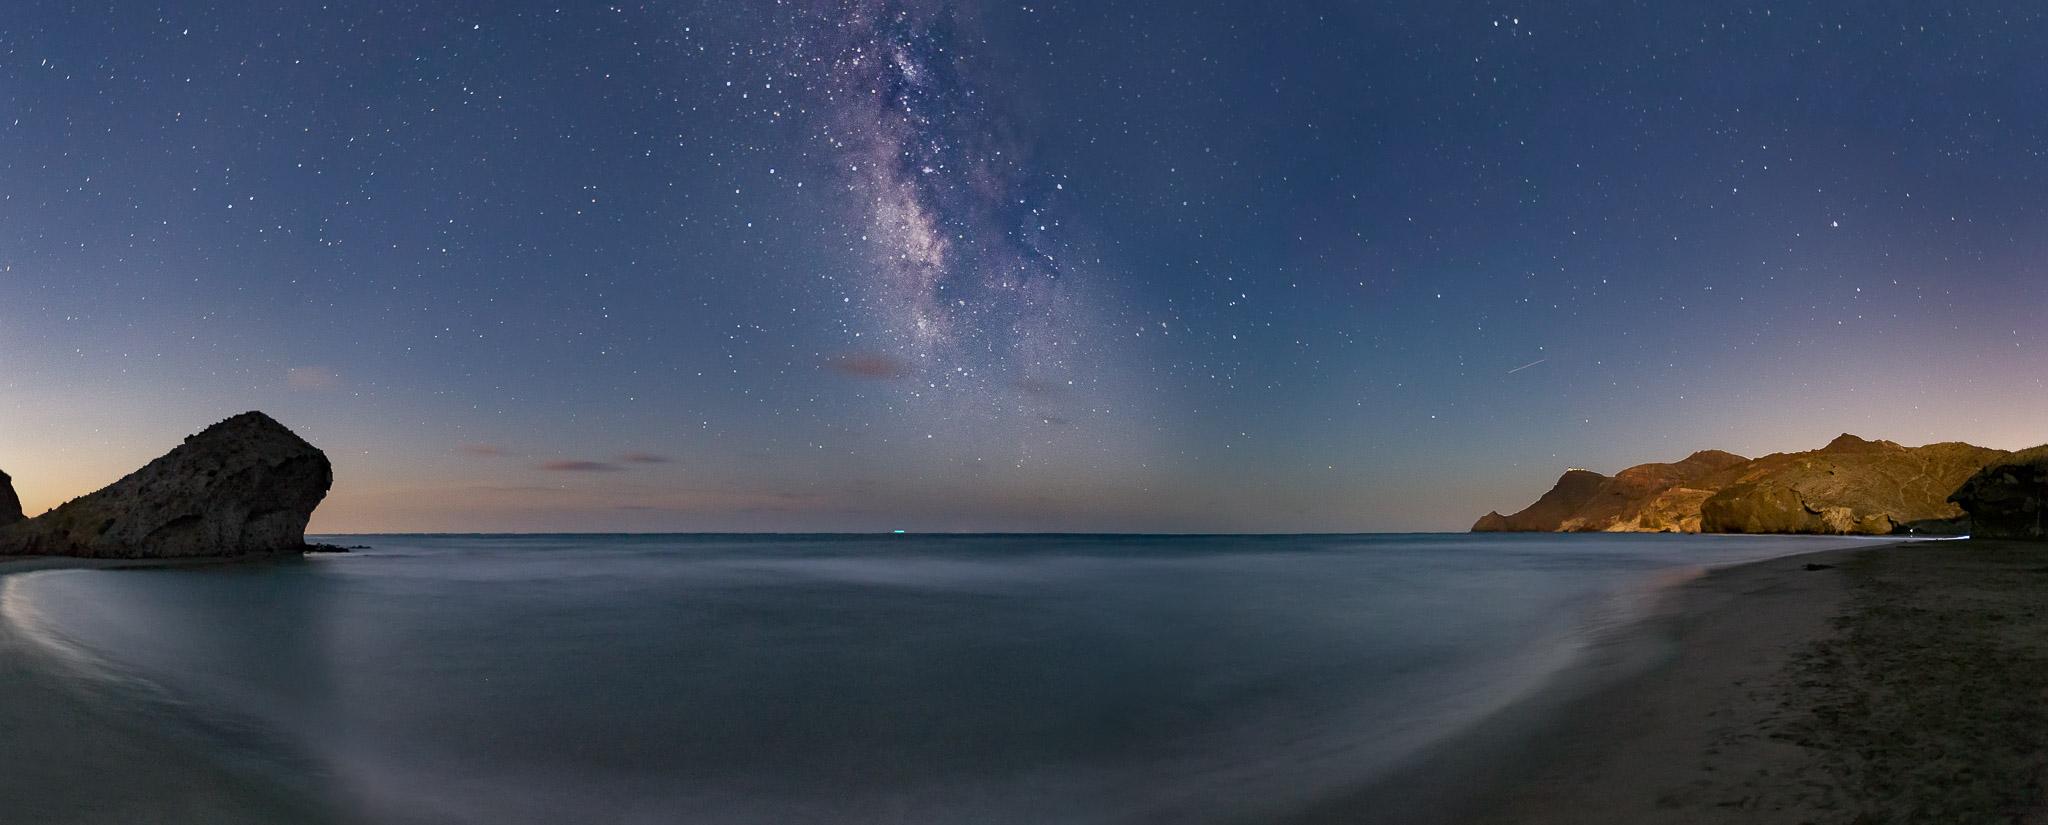 Paisaje de la Playa del Monsul, Almeria, via lactea, panorámica nocturna, canon 6D,Danilatorre,danilatorre, Dani Latorre, daniel Latorre